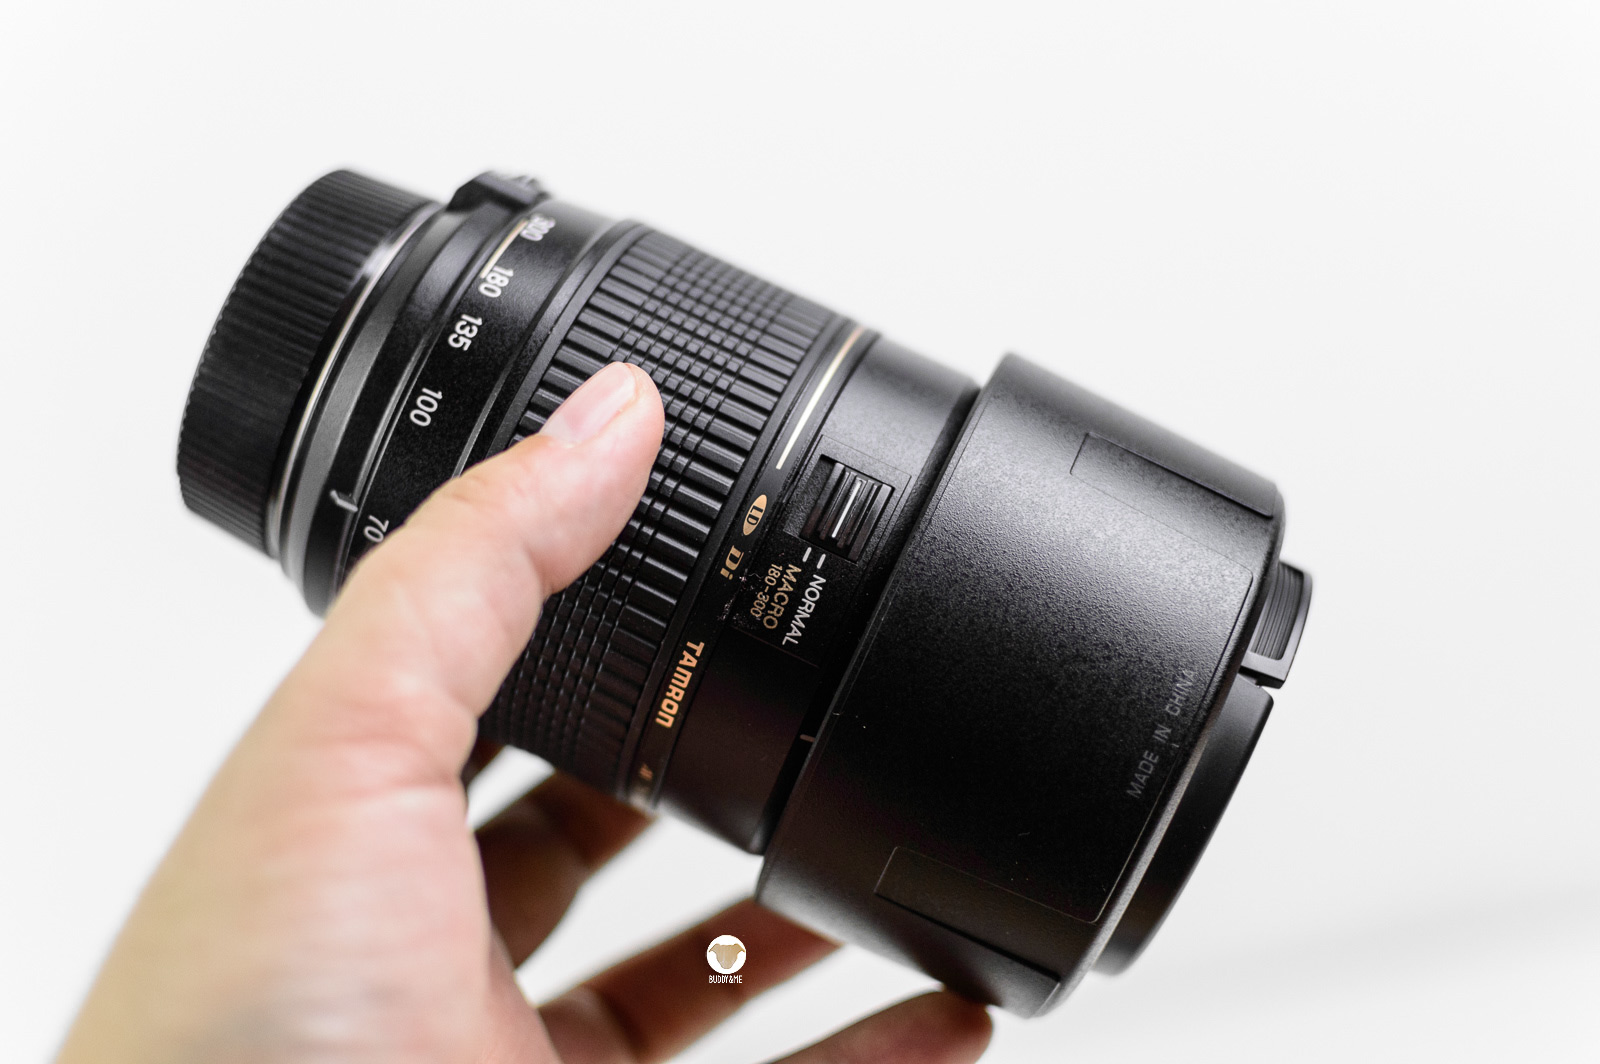 Pinscher Buddy, Buddy and Me, Hundeblog, Dogblog, Hundefotografie, Nikon D3200, Objektive, Bewegungsfotos, Portraits, Sigma 105mm 2.8, Nikkor 50mm 1.8, Nikkor 35mm 1.8, Tamron 70-300mm